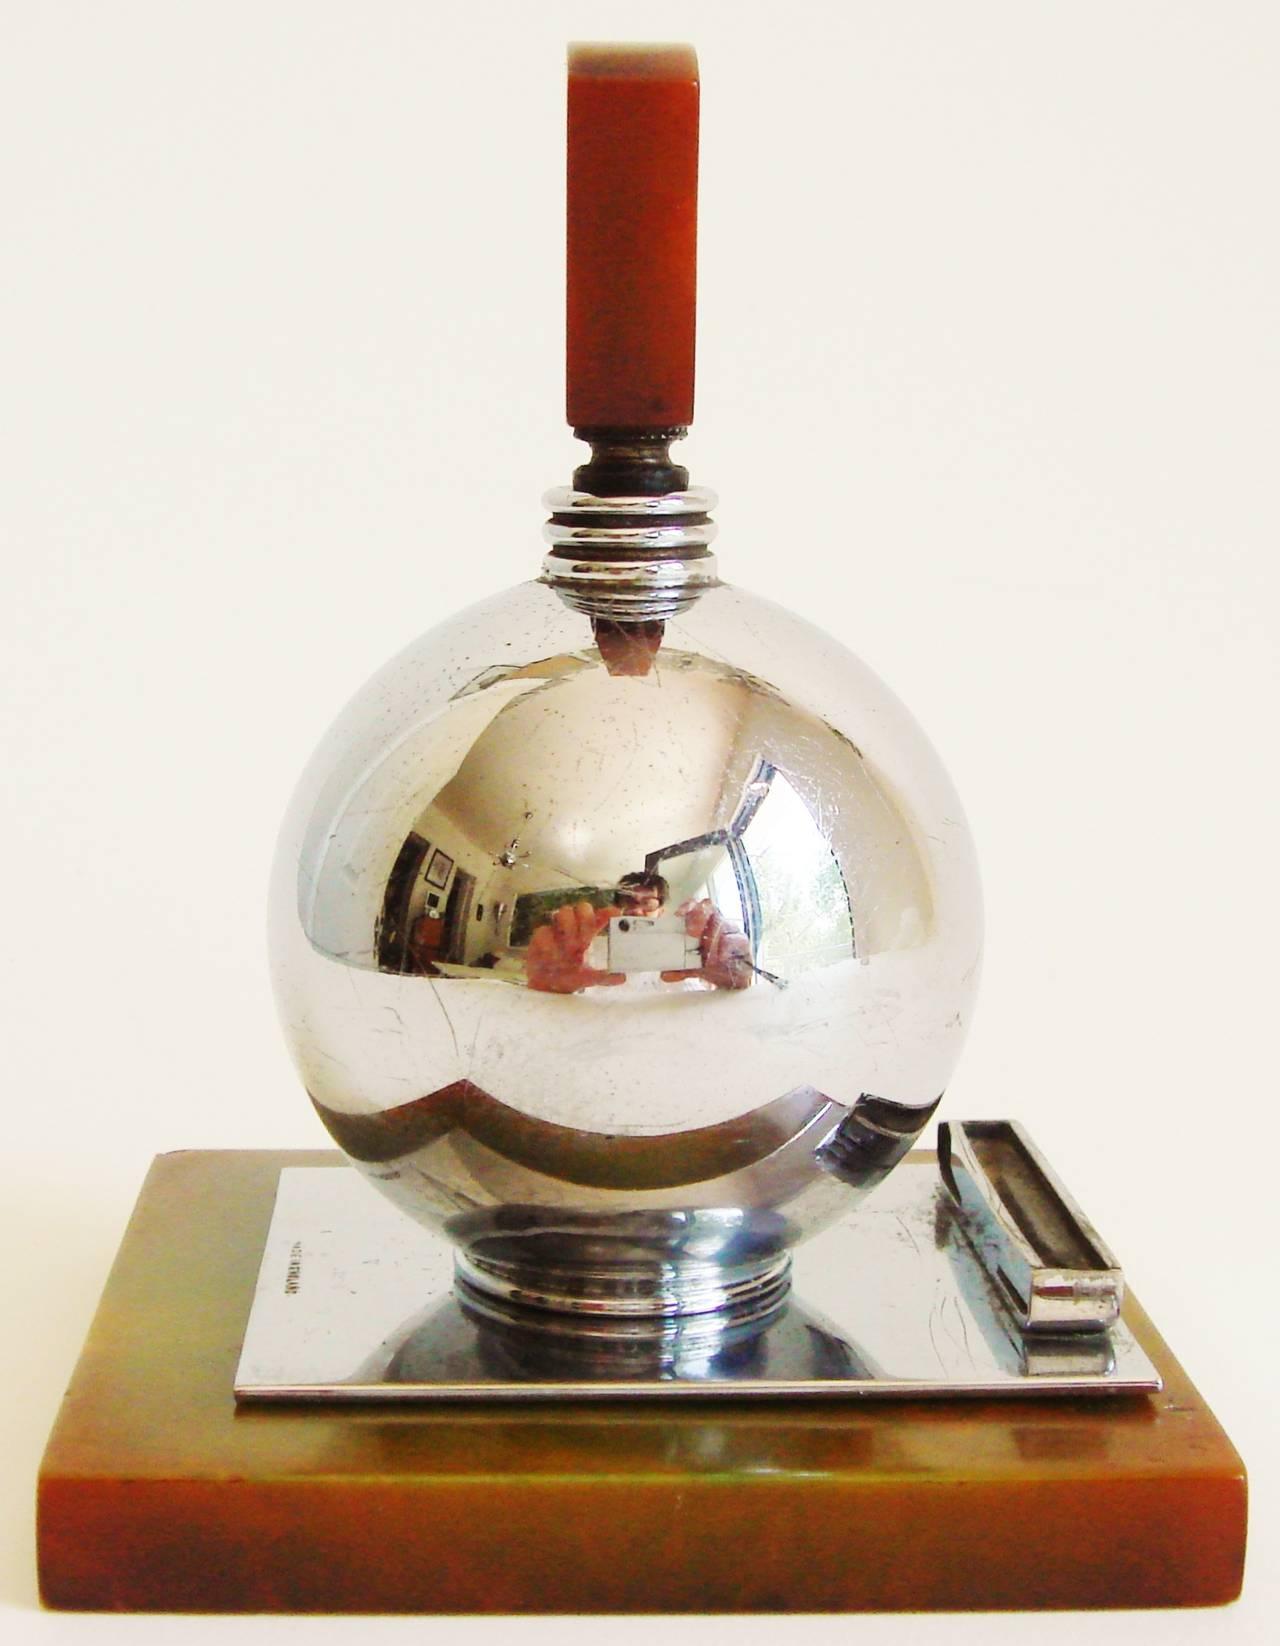 Rare English Art Deco Chrome and Bakelite Spherical Striker Table Lighter In Good Condition For Sale In Port Hope, ON